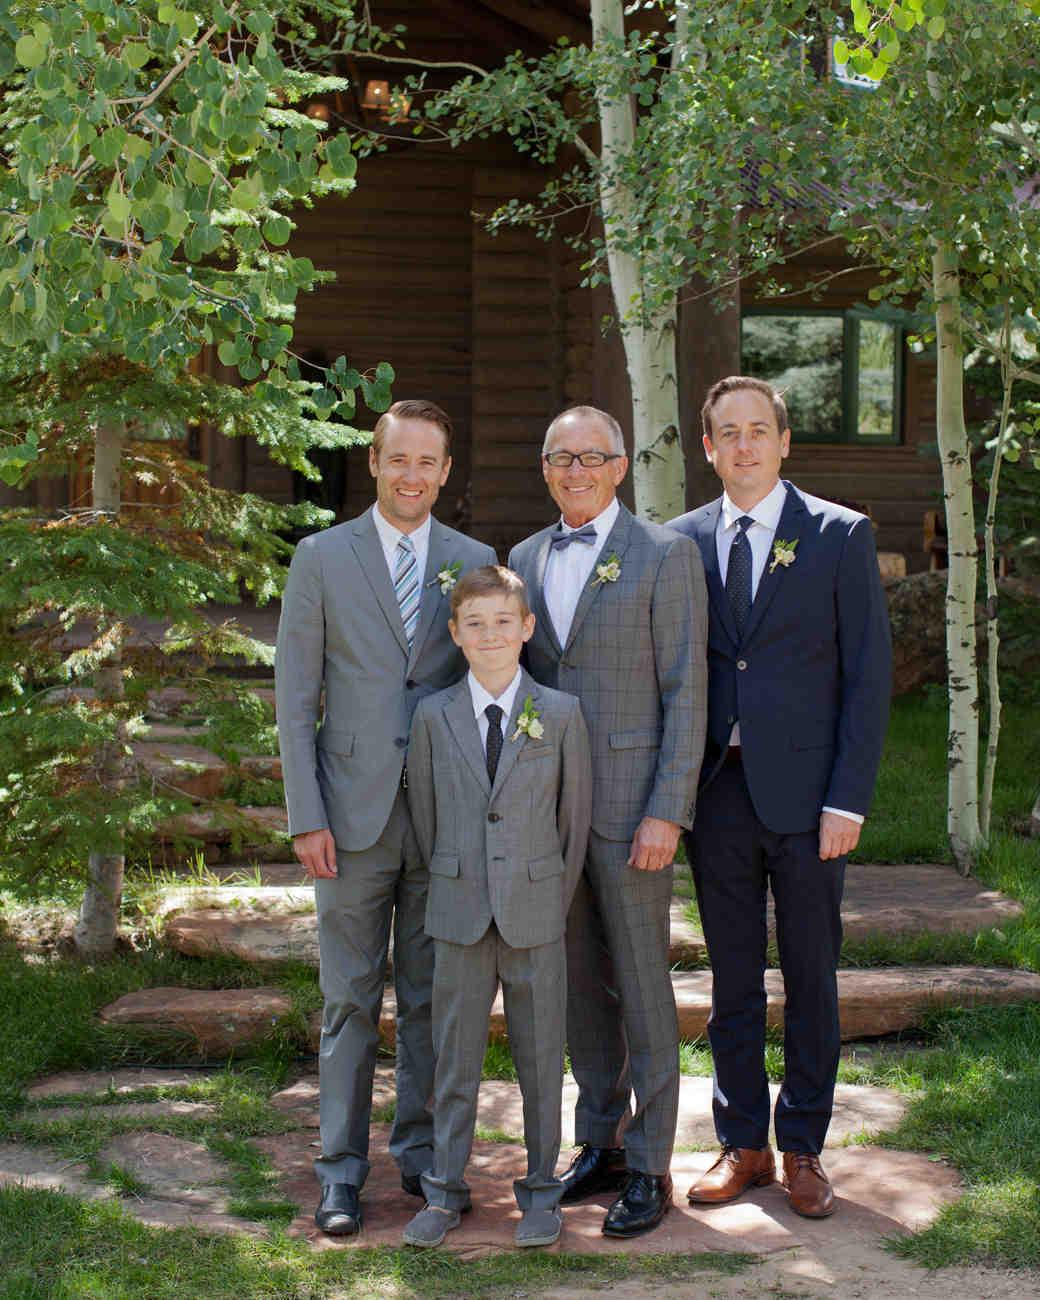 lizzy-pat-wedding-family-069-s111777-0115.jpg